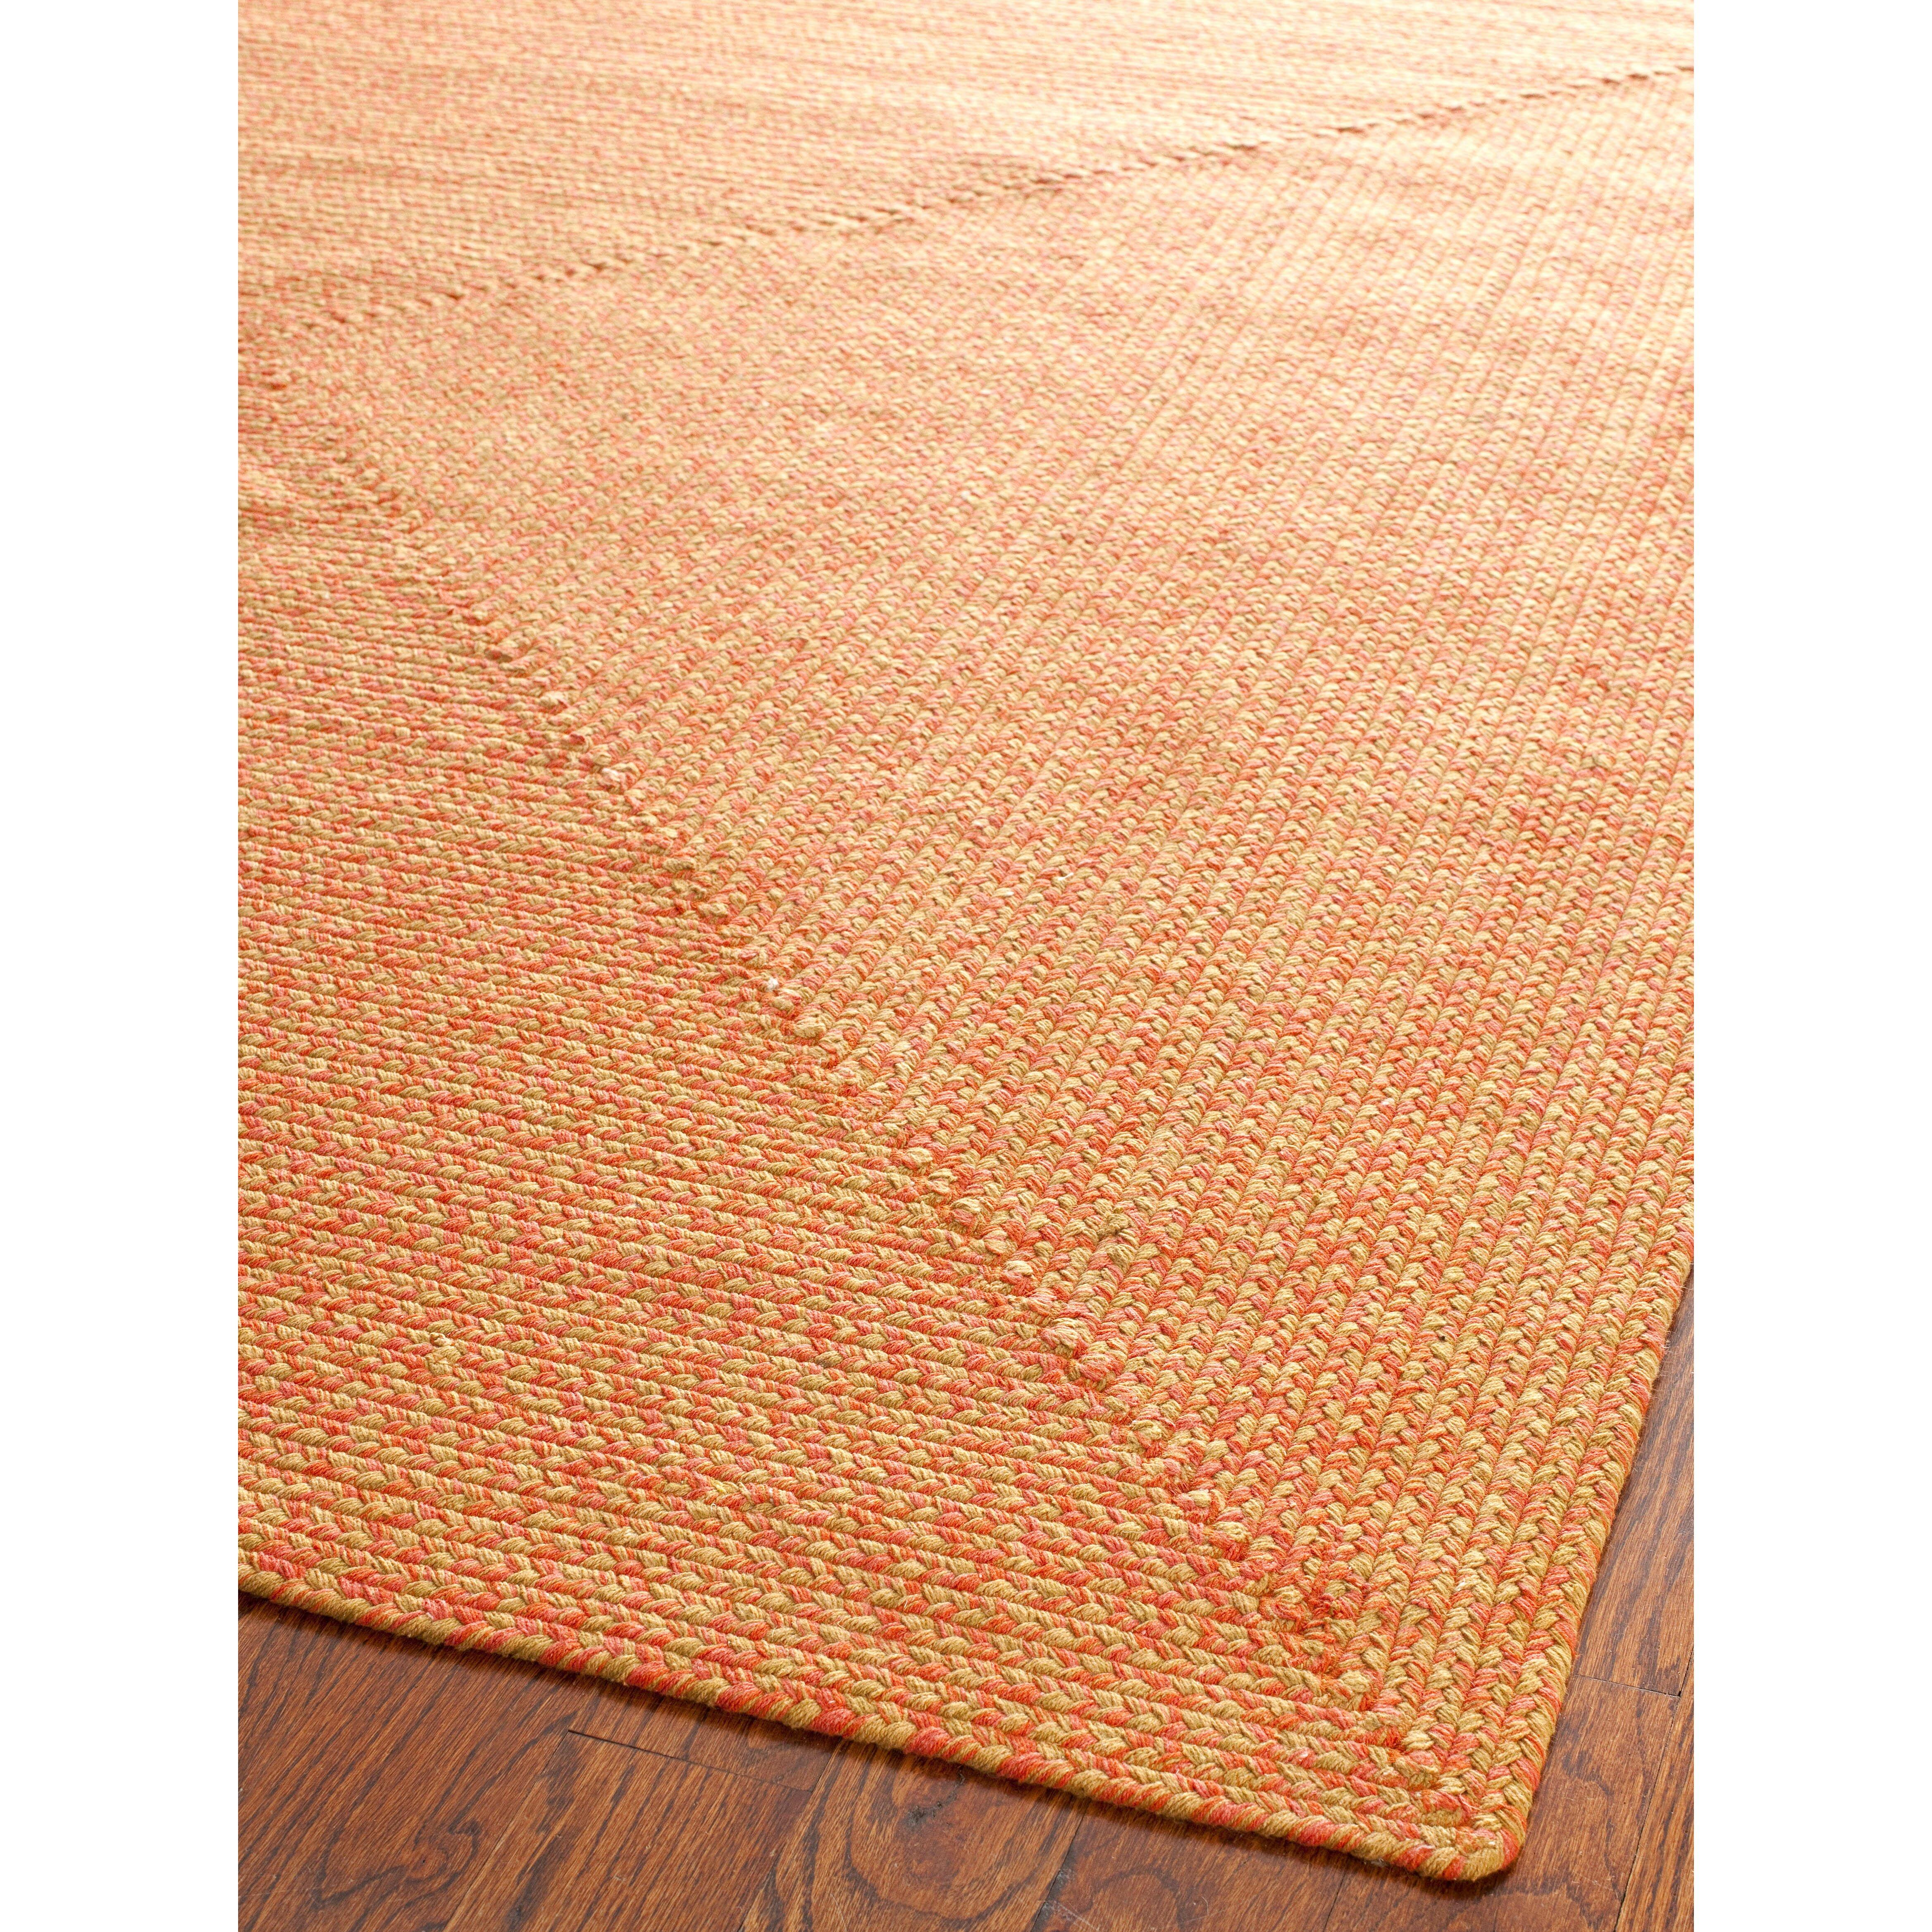 Safavieh braided beige multi area rug reviews wayfair for Safavieh rugs